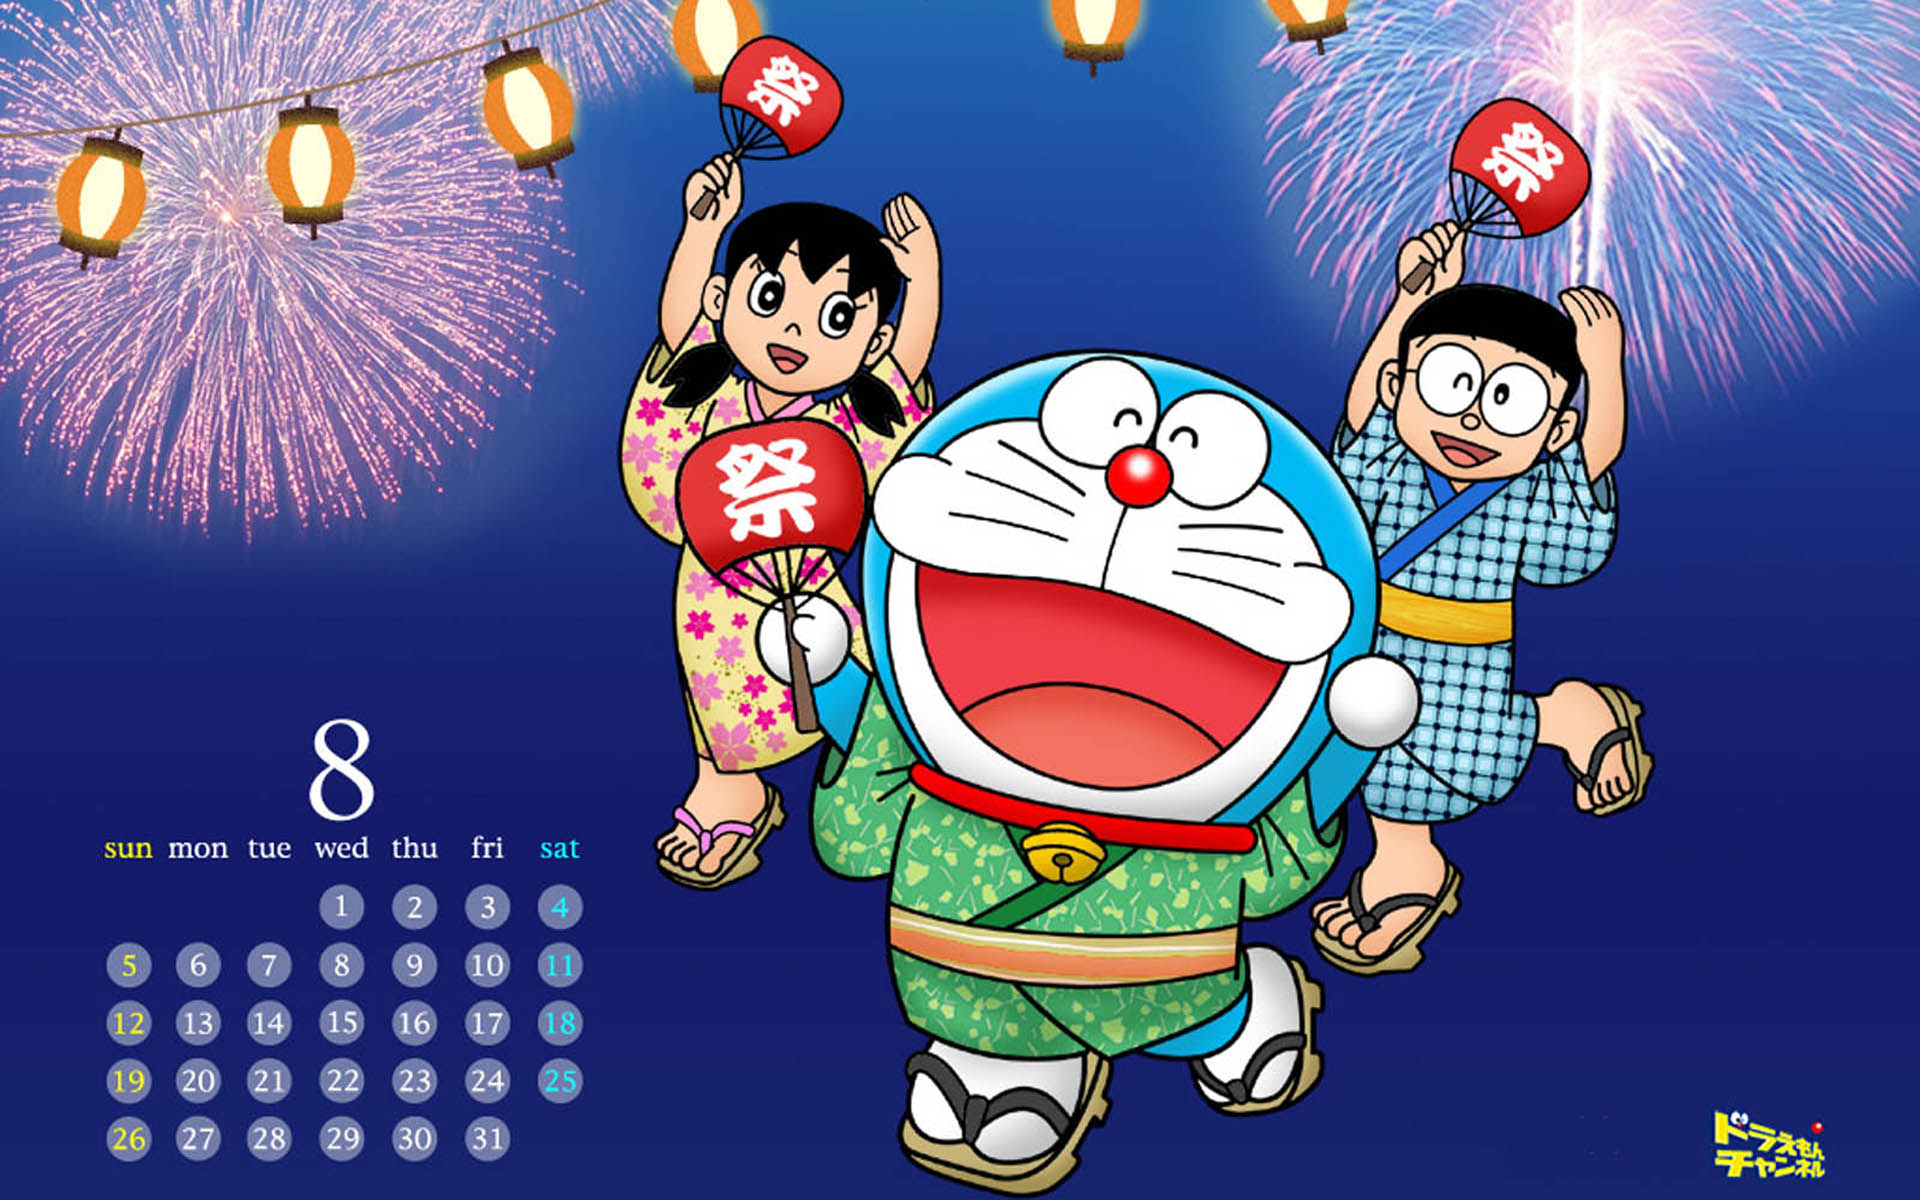 Download wallpaper doraemon free - Doraemon 3d Wallpapers Hd Free 382336